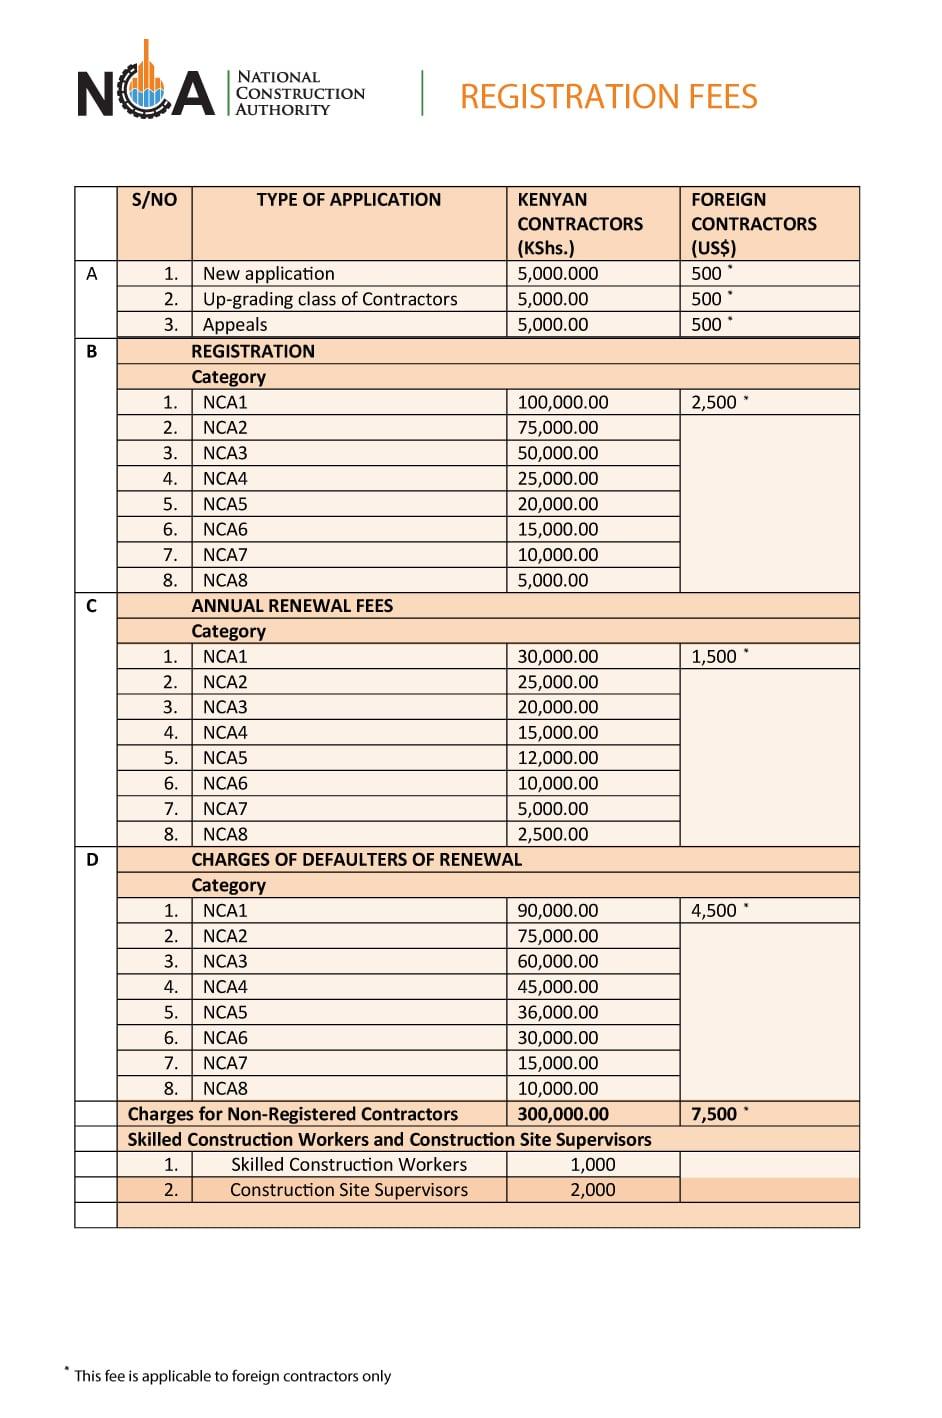 NCA registration requirements for contractors